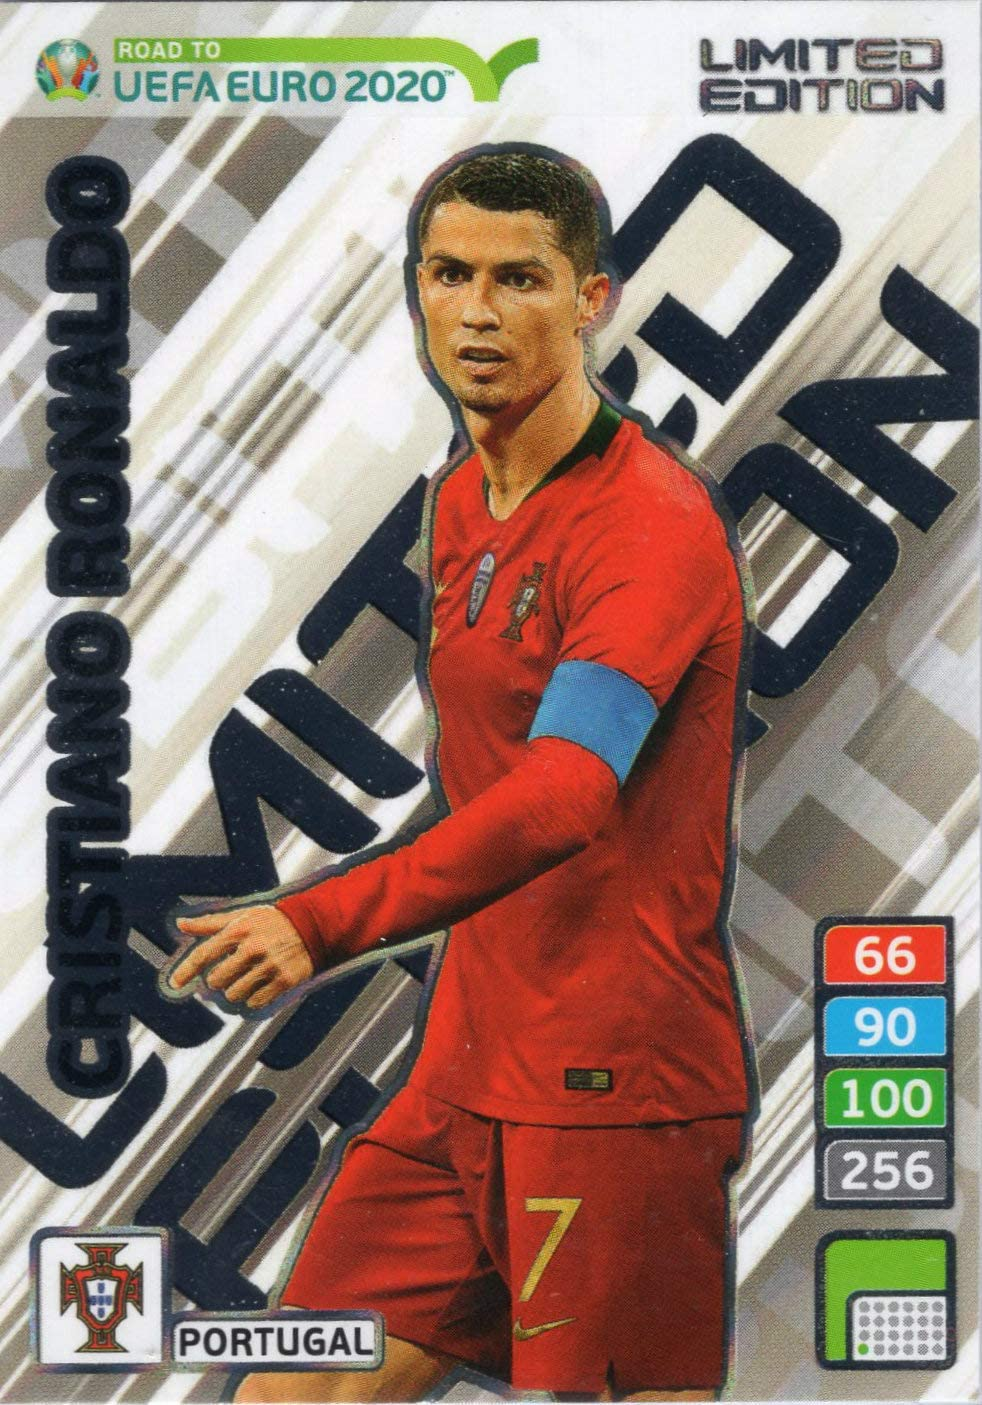 Adrenalyn XL Road to Euro 2020 - Cristiano Ronaldo Limited ...